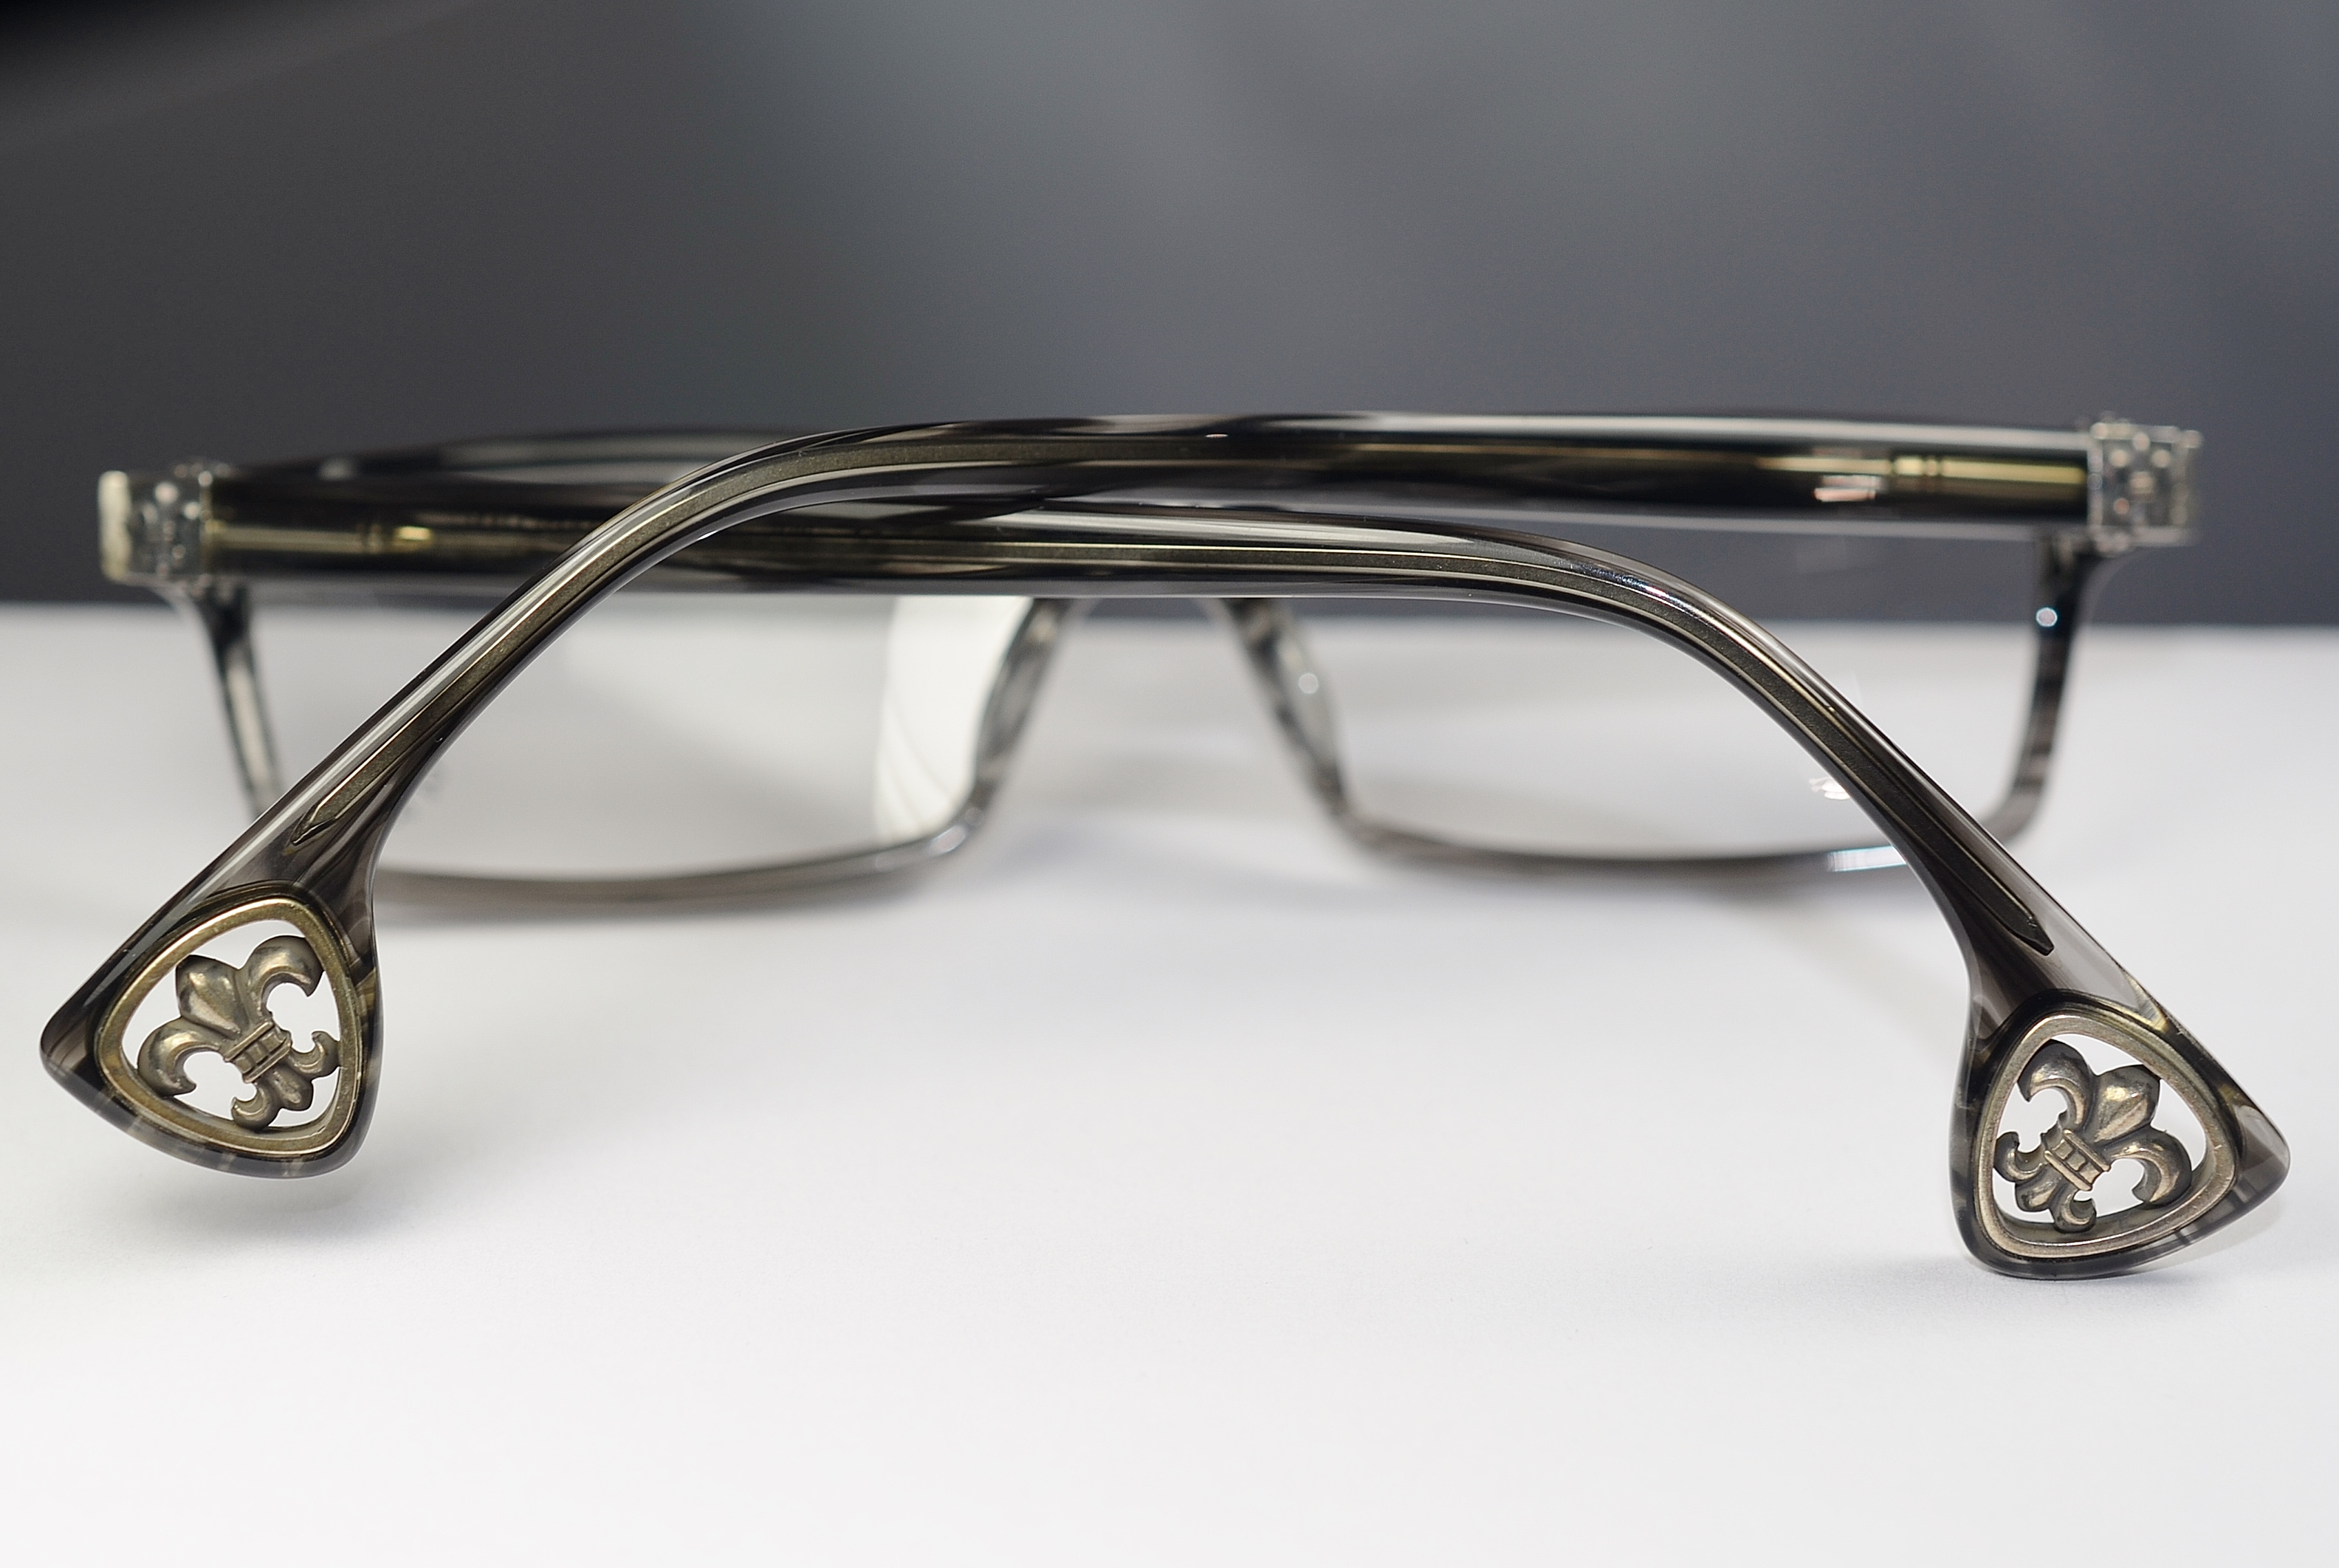 Chrome Hearts JABLOME BKS Black Stripe Glasses Eyewear Eyeglass ...